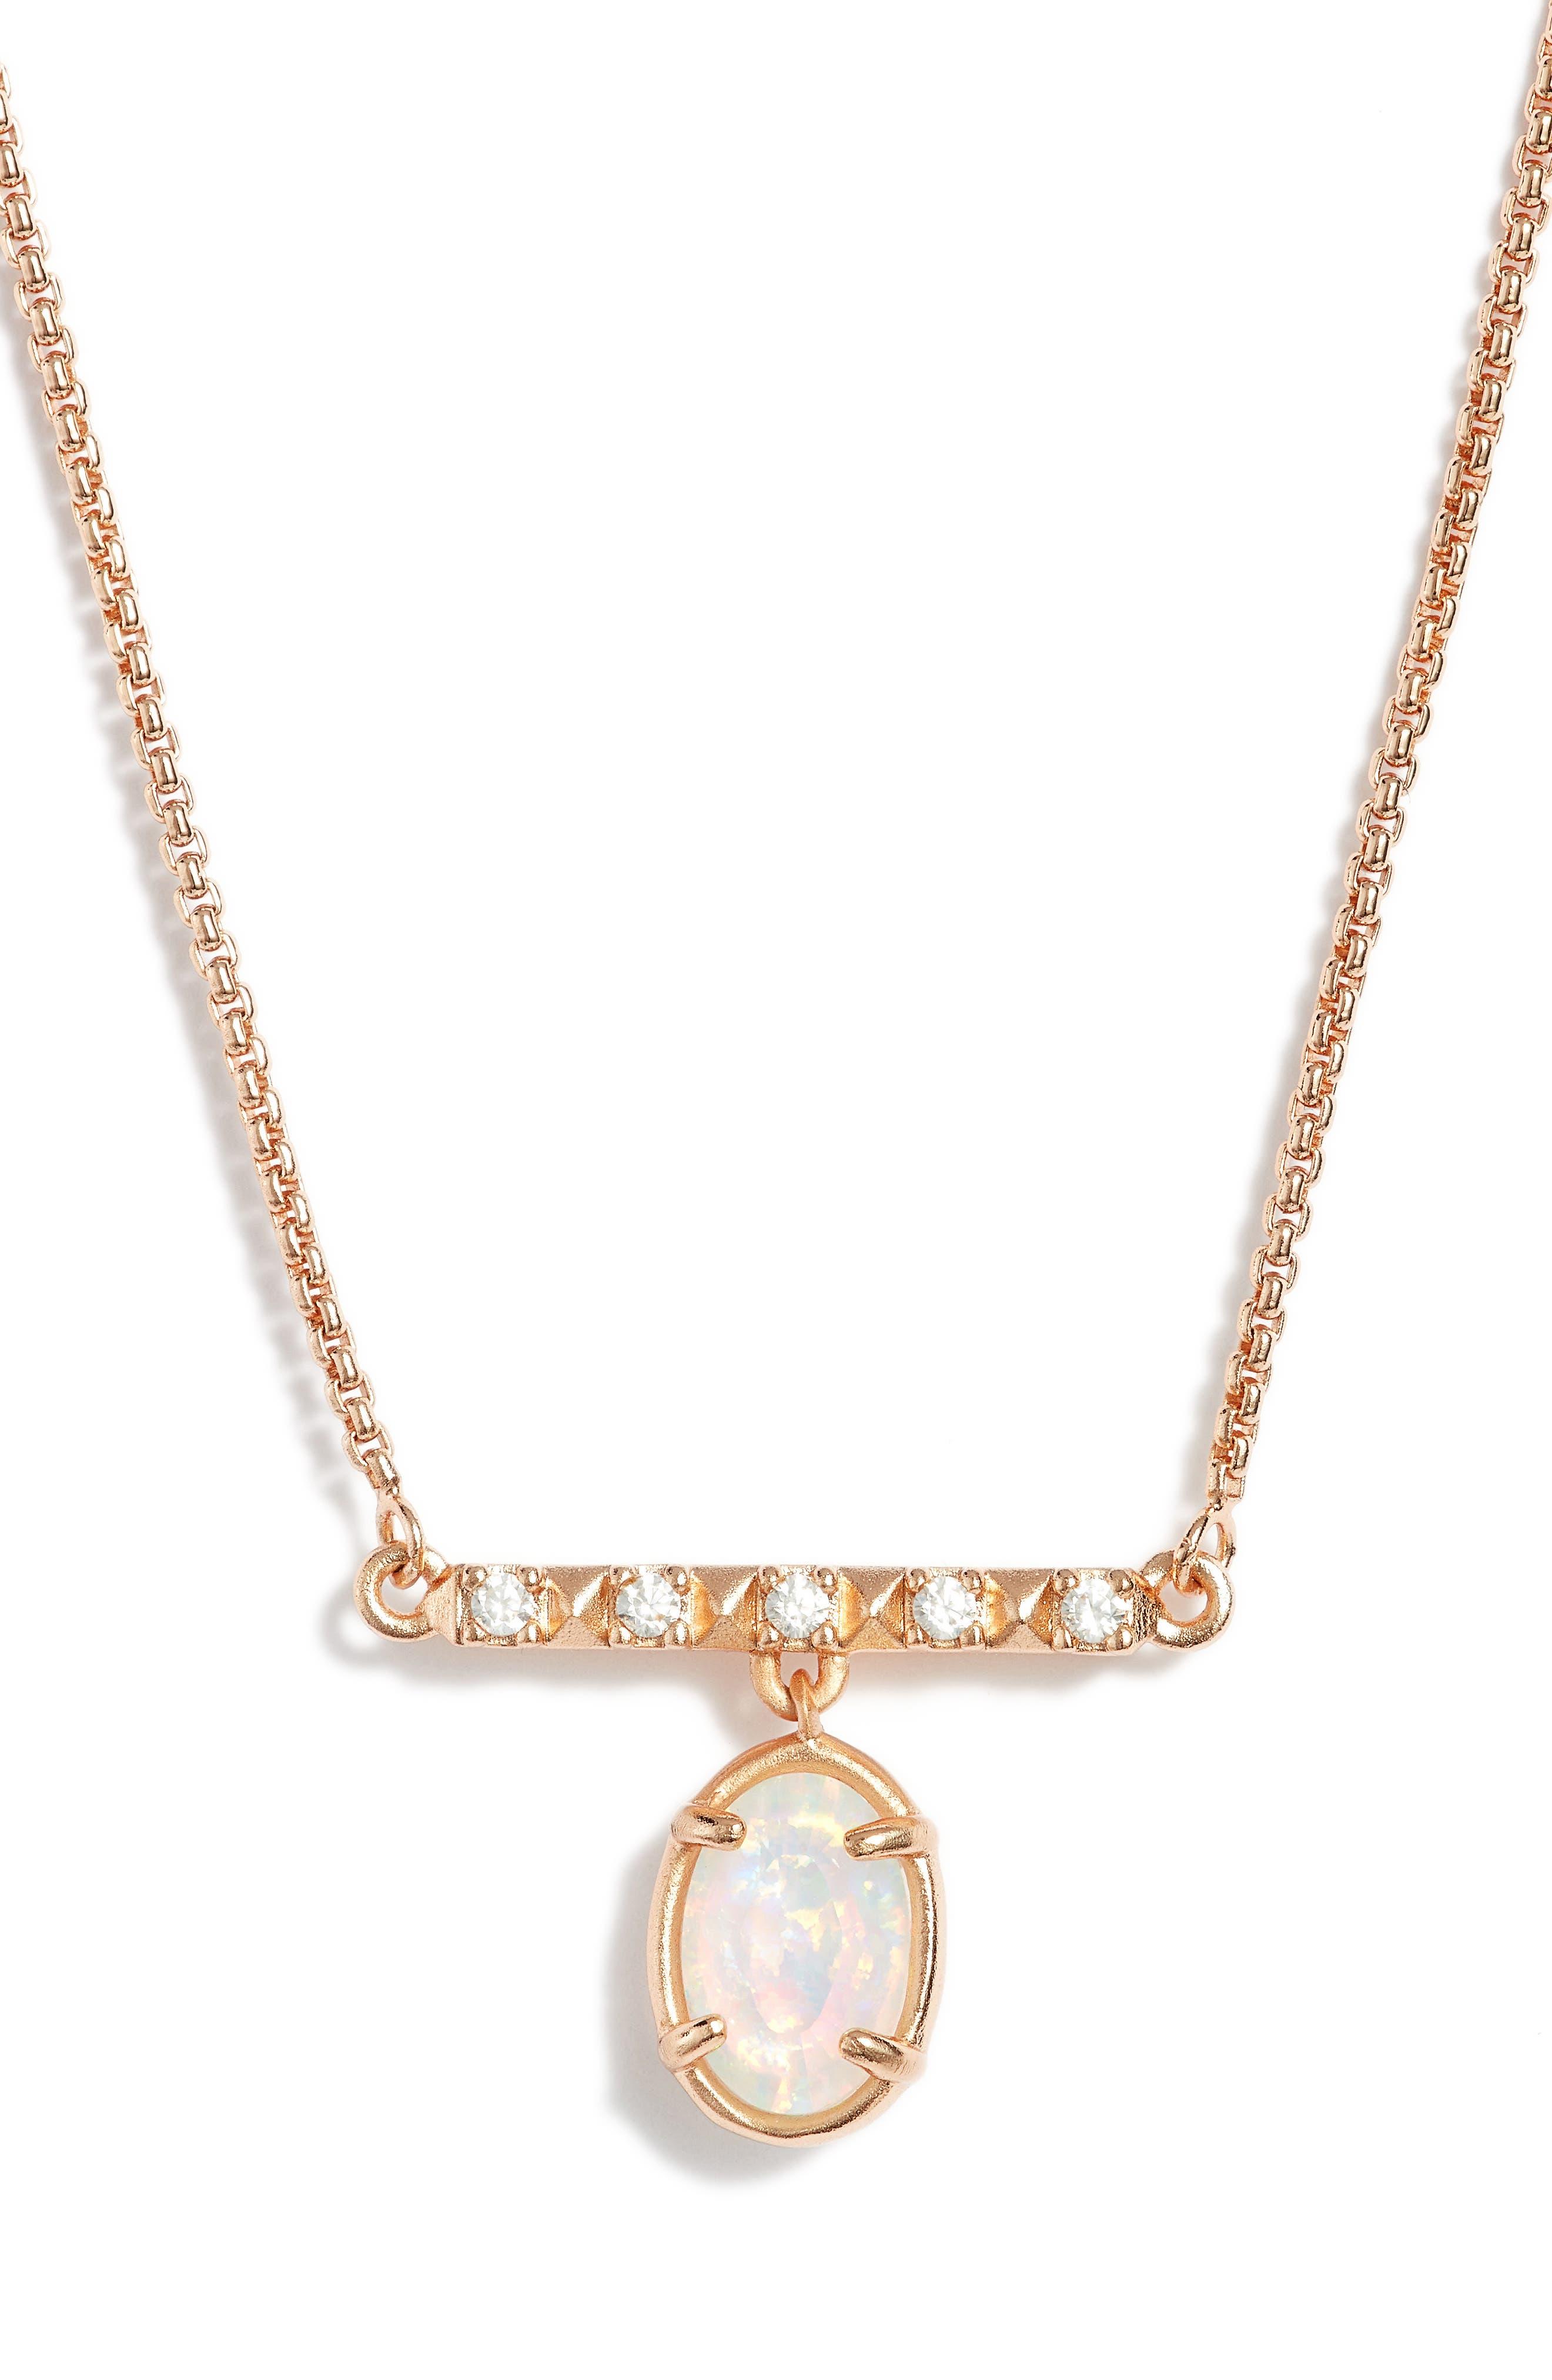 Main Image - Kendra Scott Fischer Opal Pendant Necklace